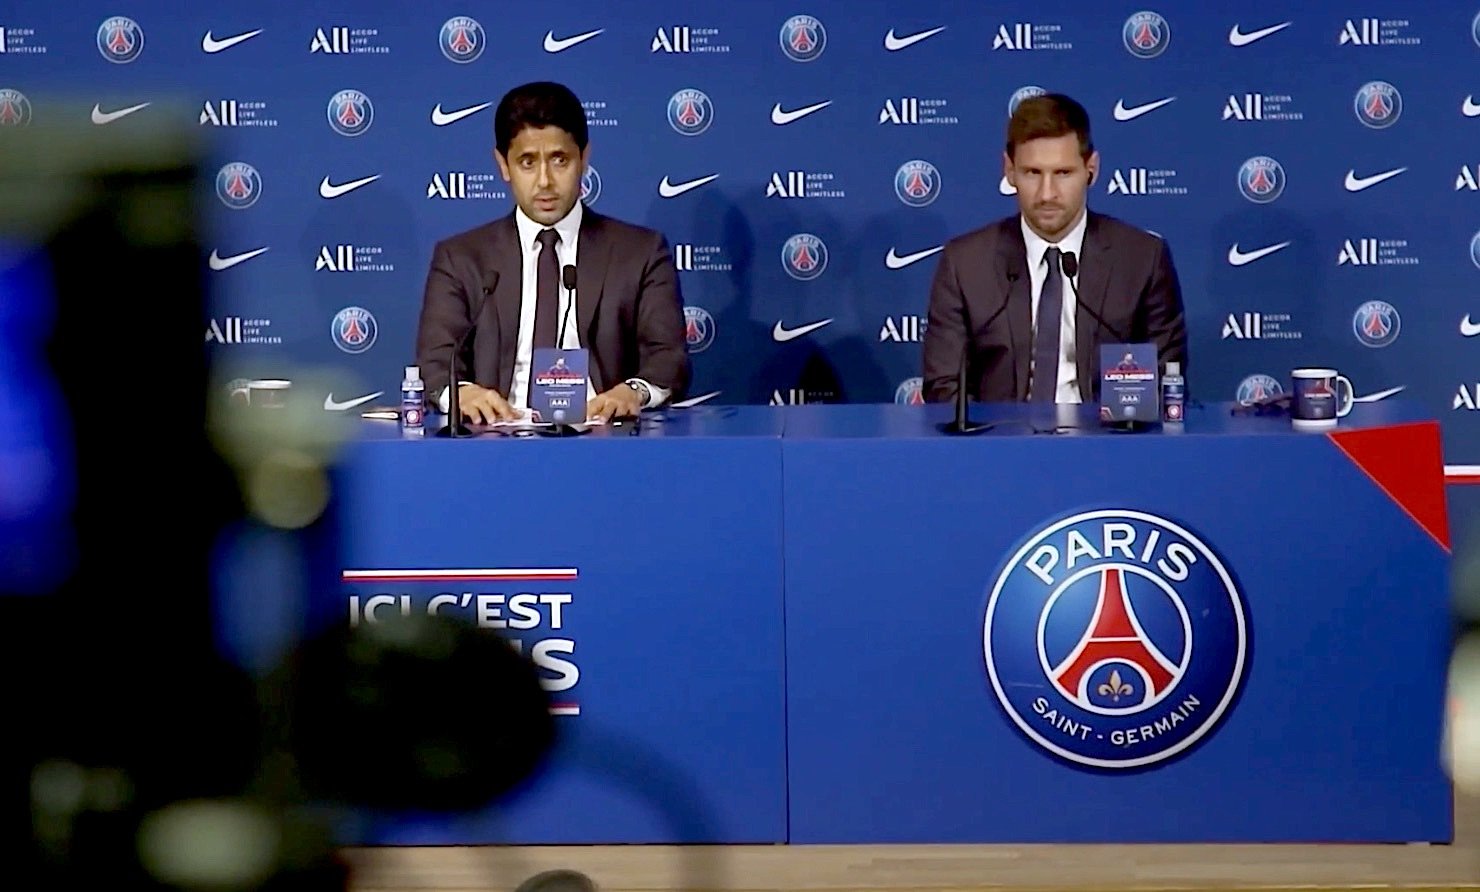 Nasser al-Khelaïfi et Lionel Messi (©psgtv)